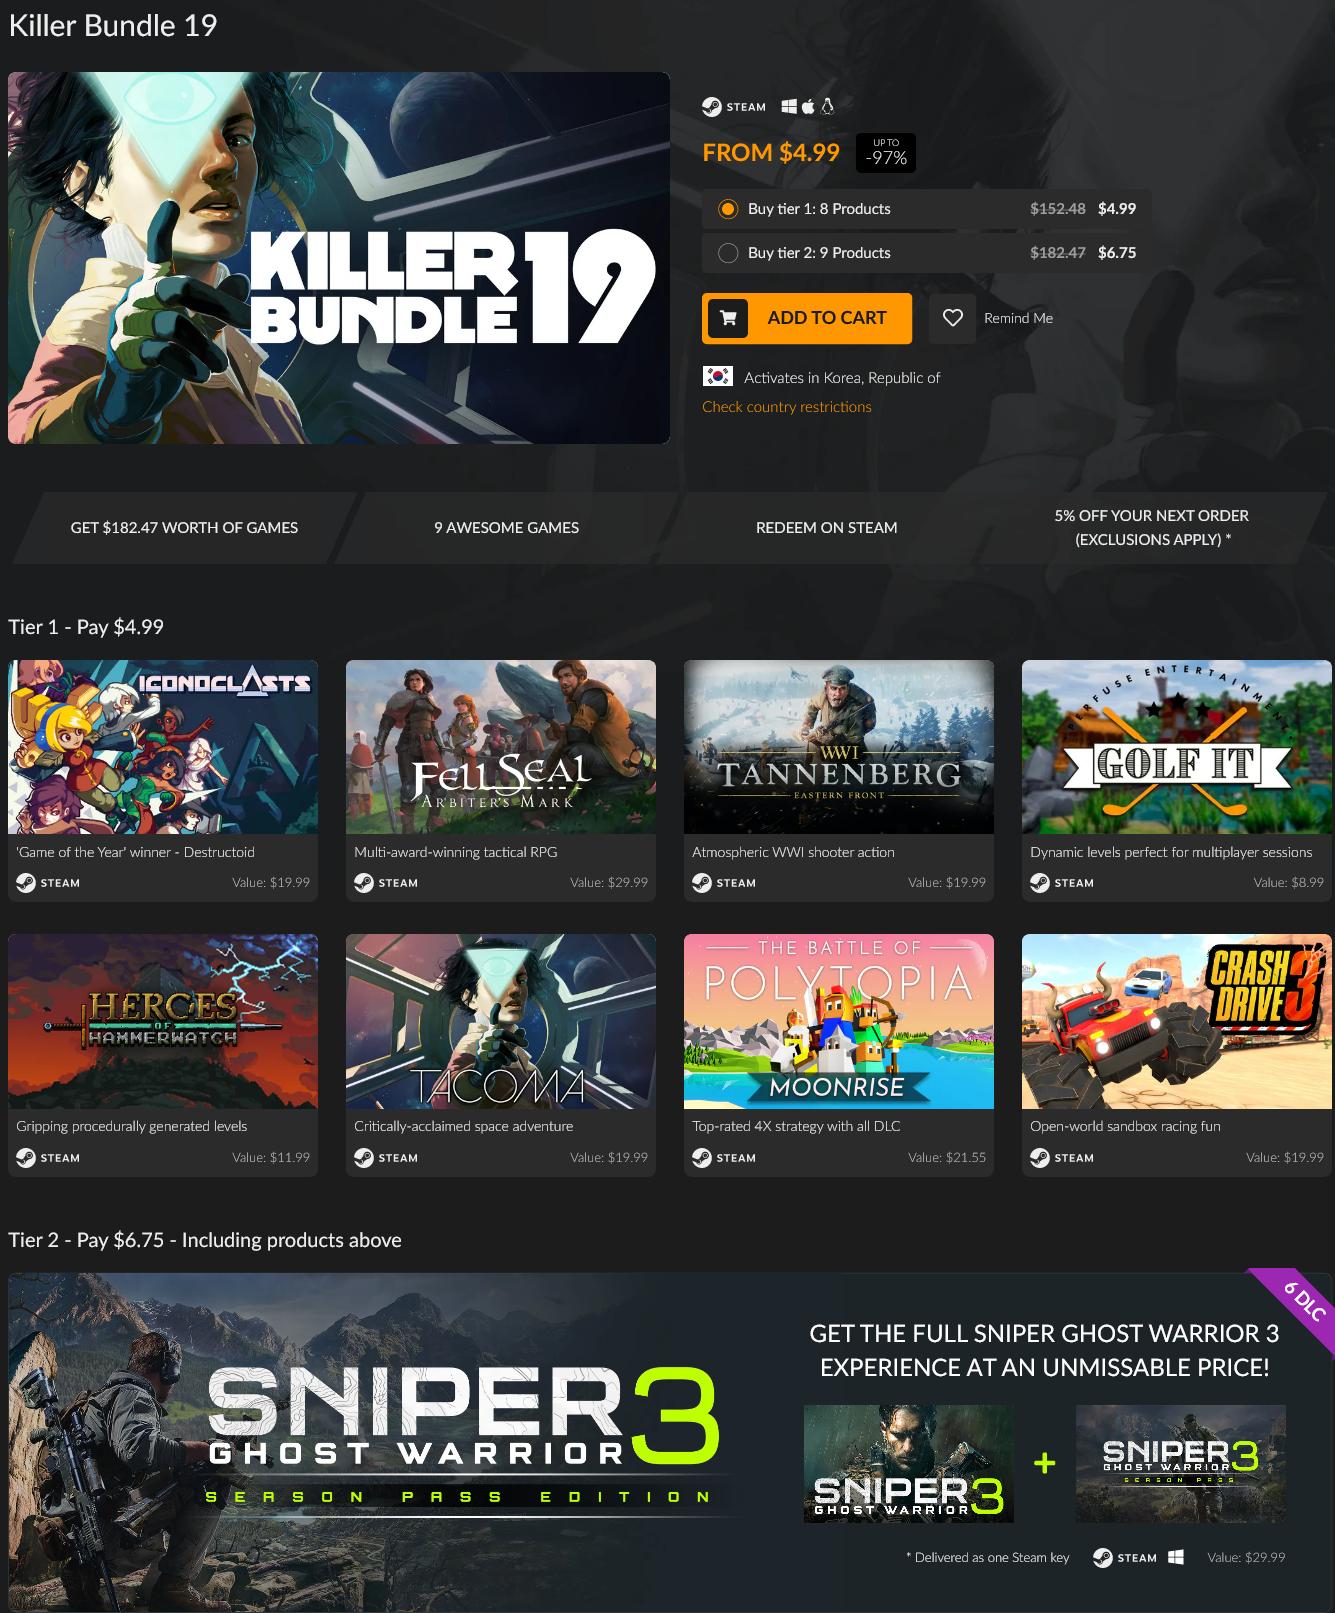 Screenshot 2021-09-21 at 02-50-30 Killer Bundle 19 Steam Game Bundle Fanatical.png